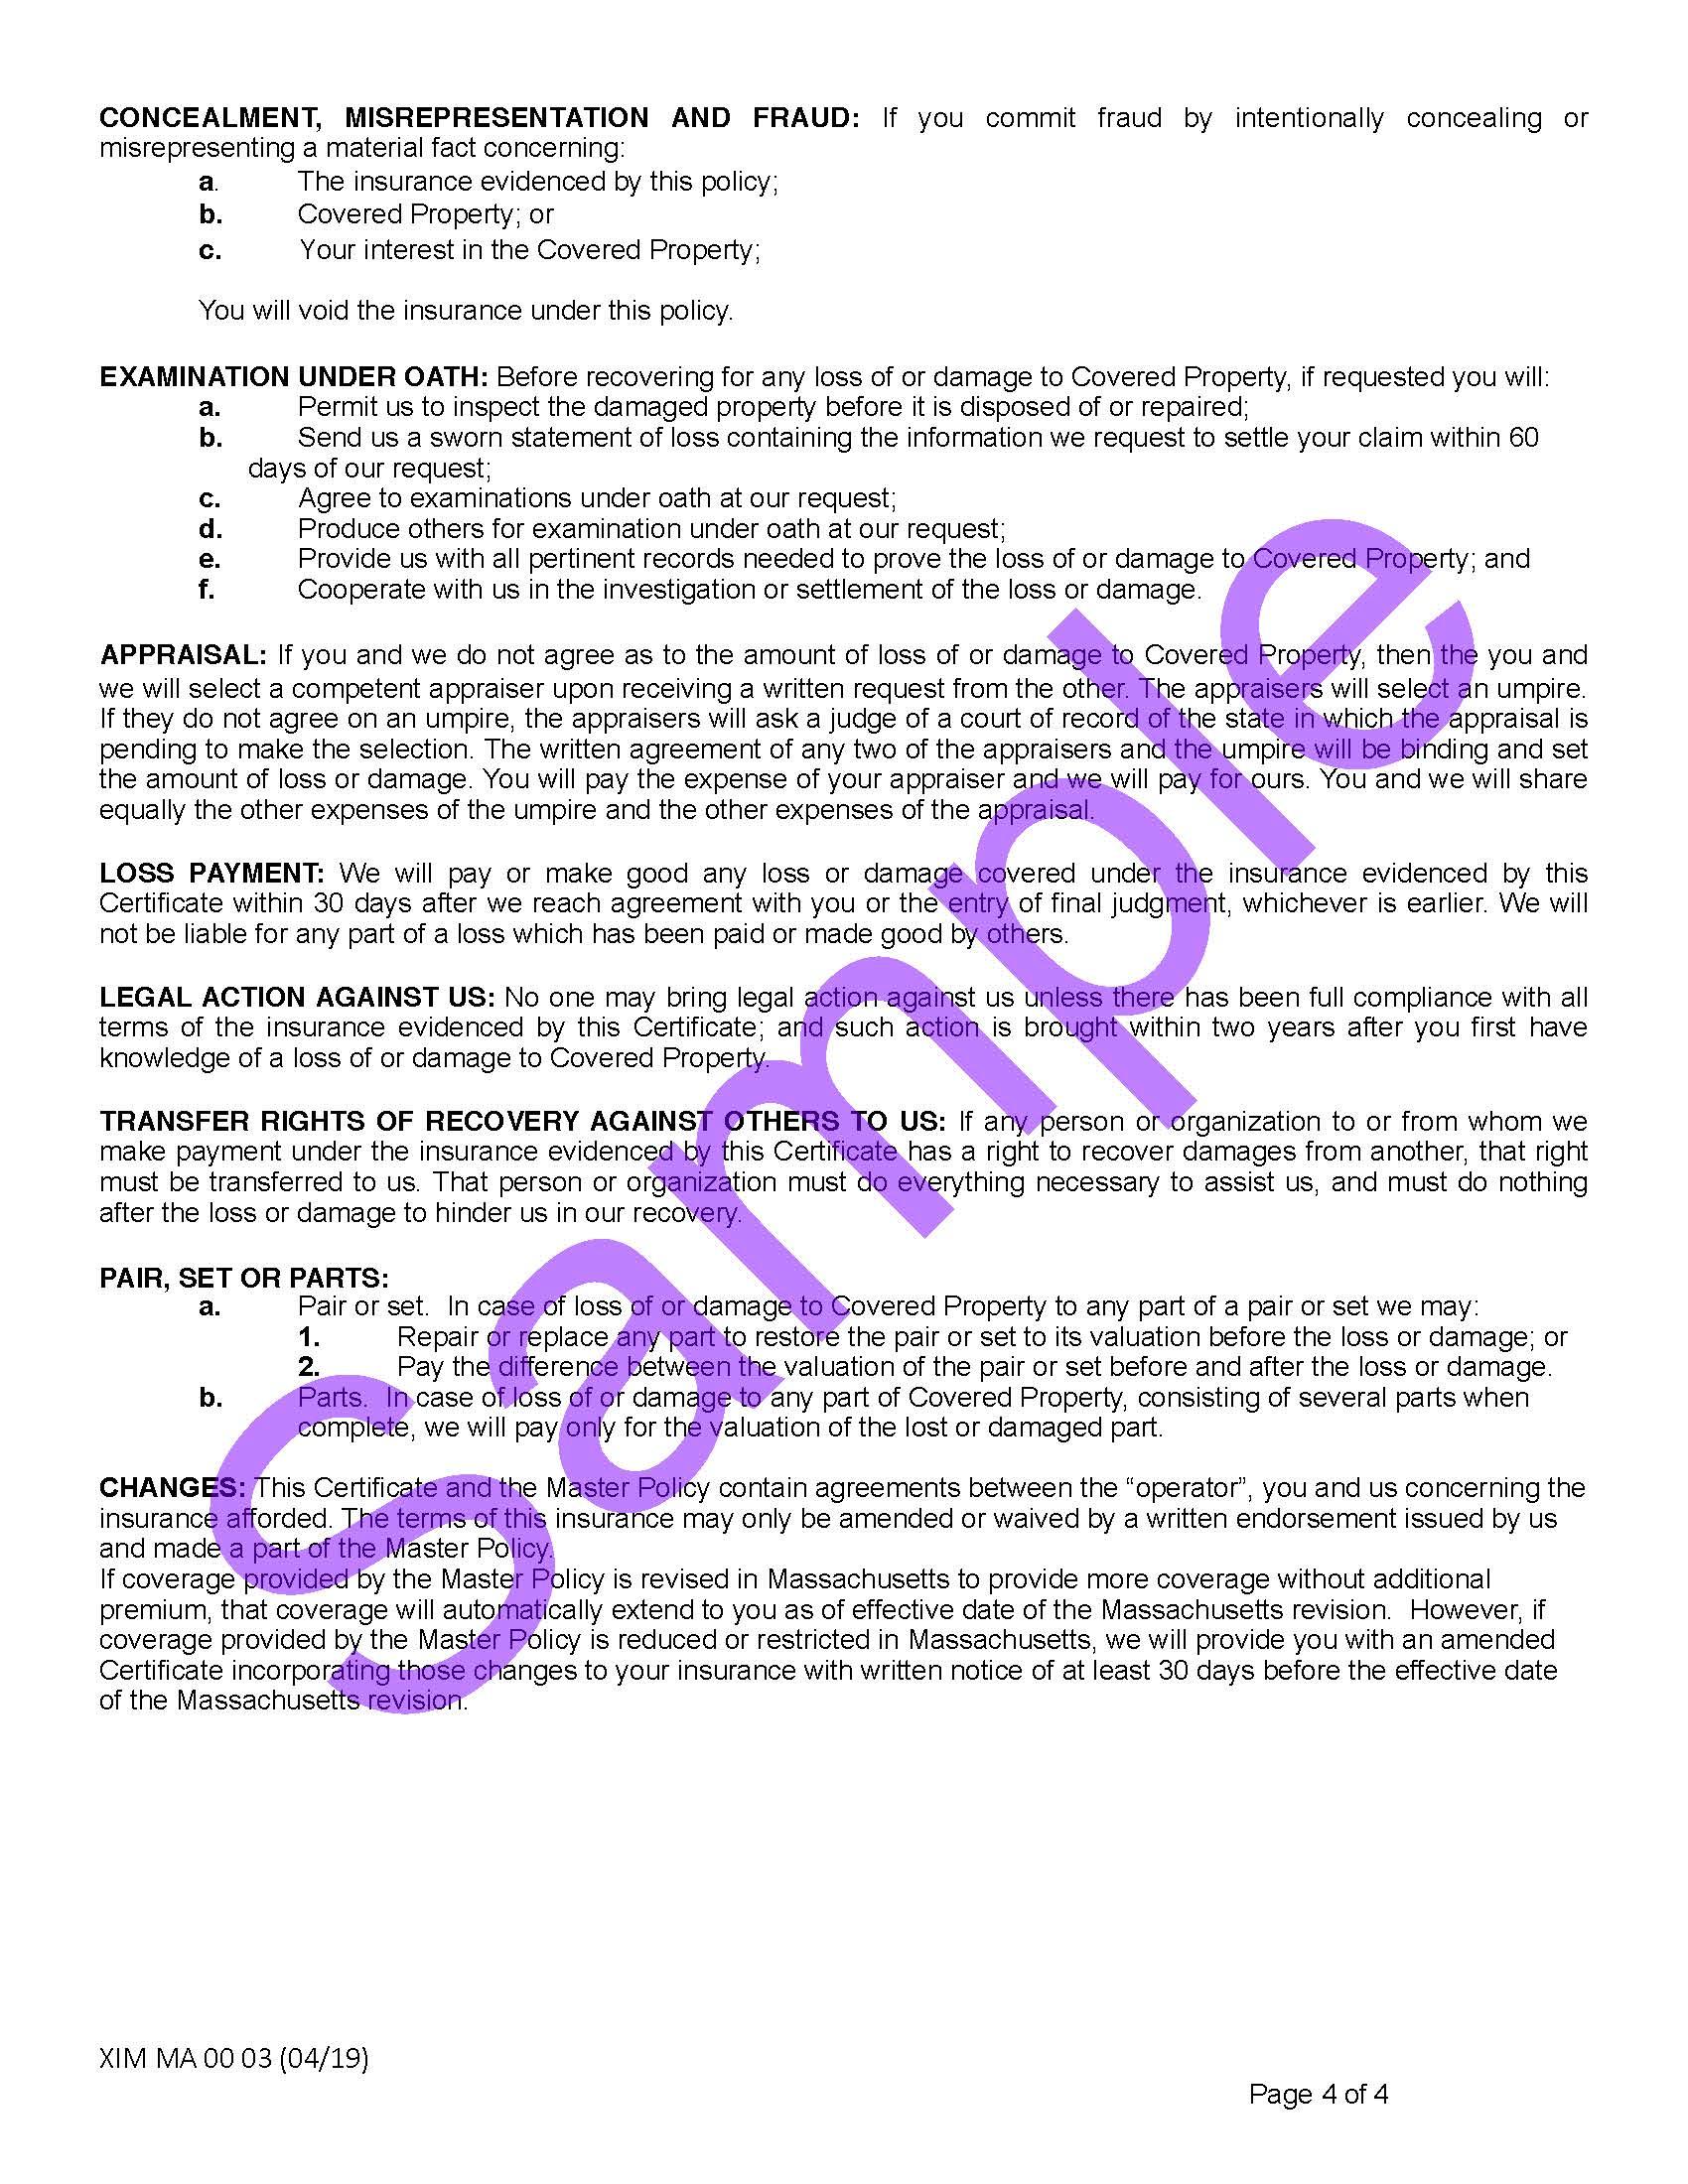 XIM MA 00 03 04 19 Massachusetts Certificate of Storage InsuranceSample_Page_4.jpg